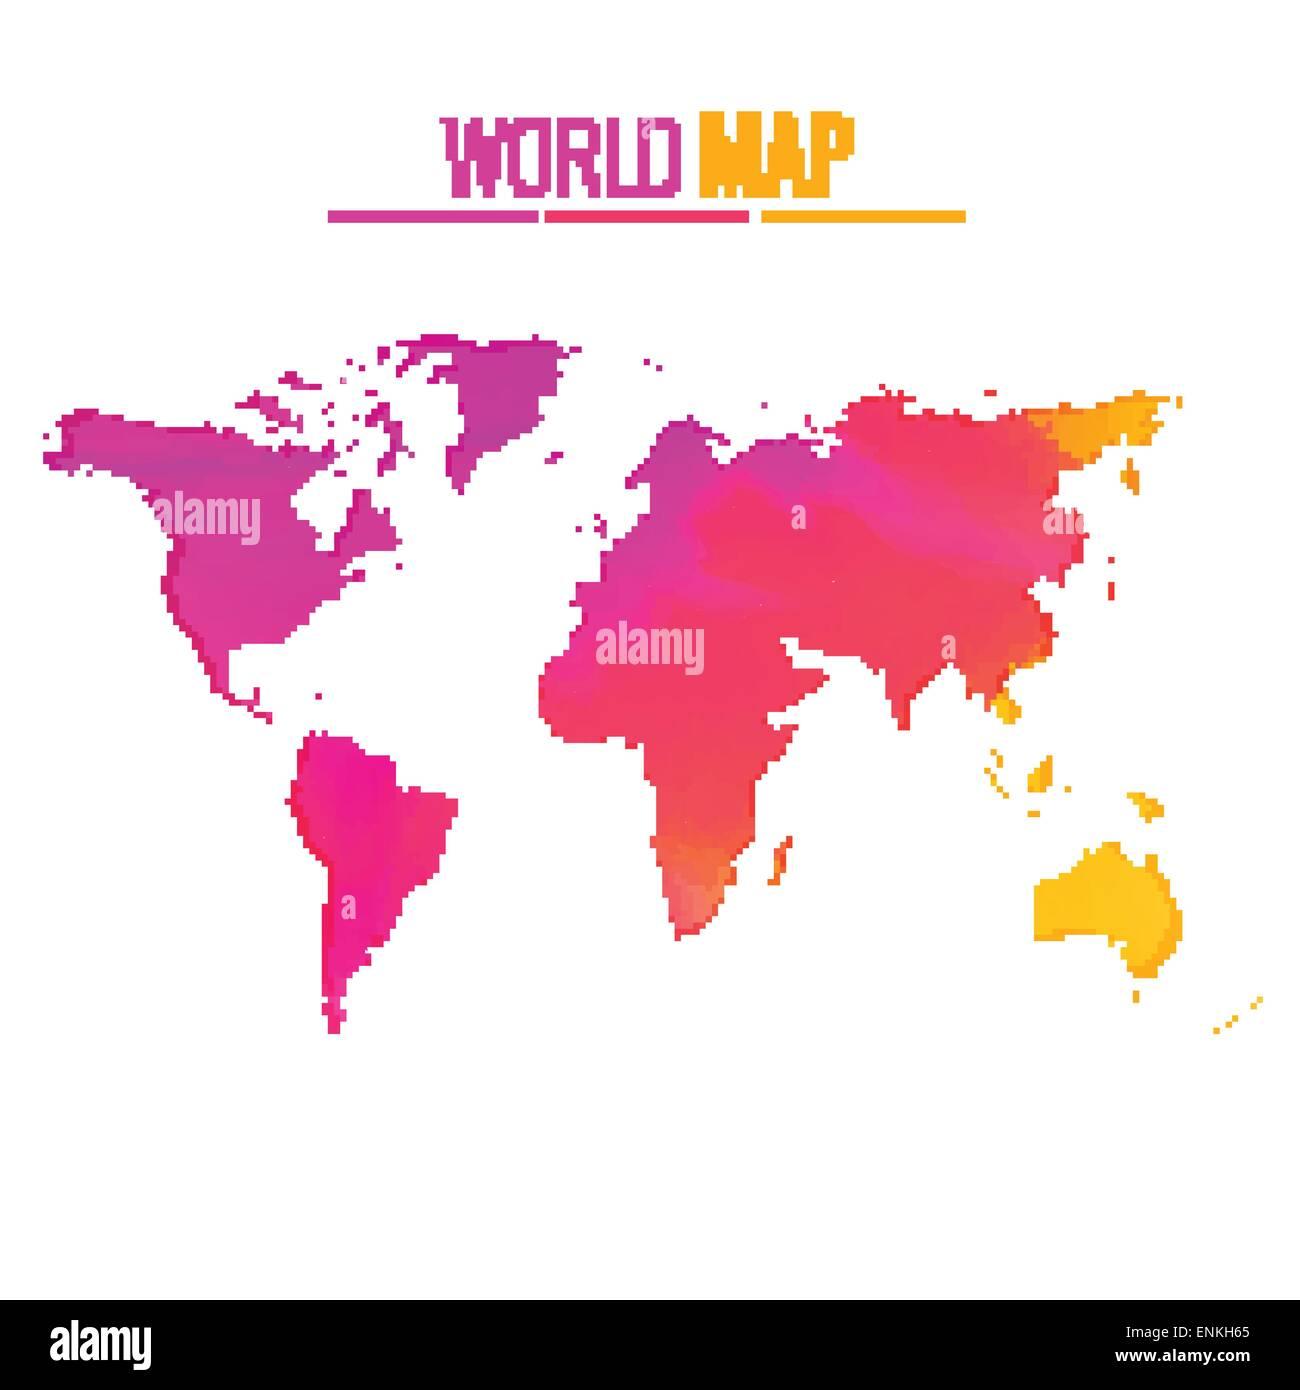 Colorful world map vector design illustration stock vector art colorful world map vector design illustration gumiabroncs Gallery